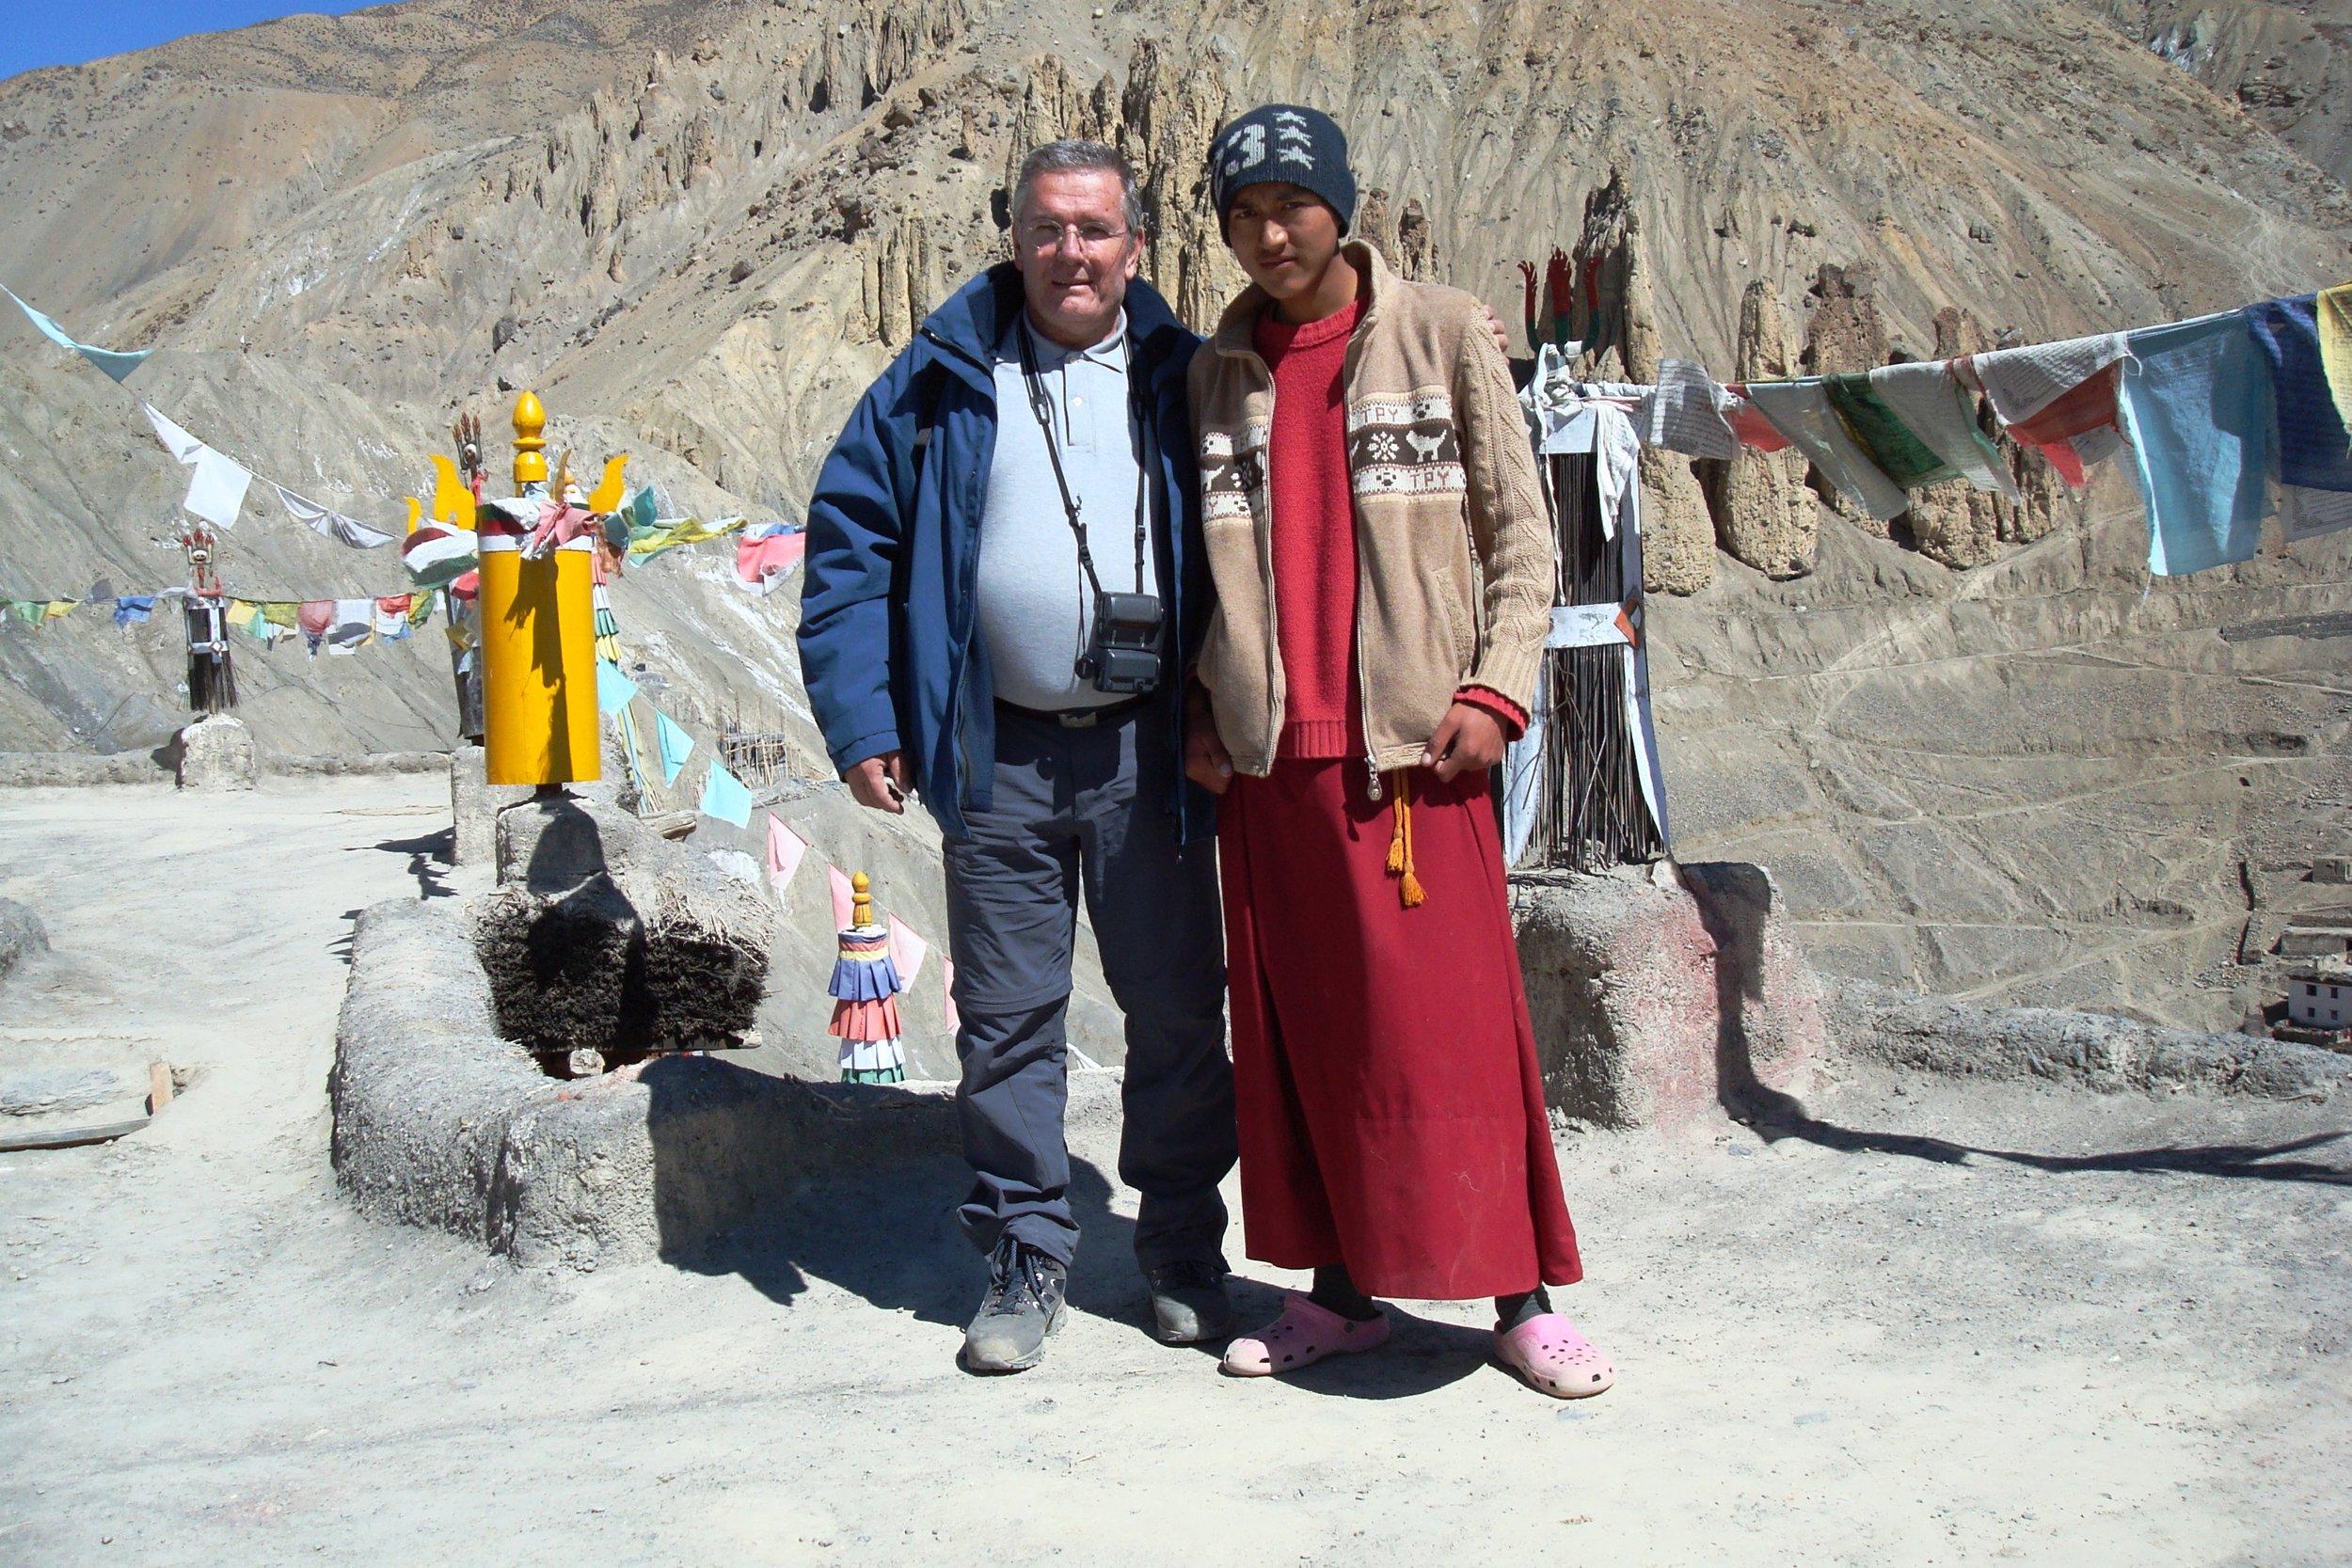 Himalaya trail, 1951 km trailrunnung